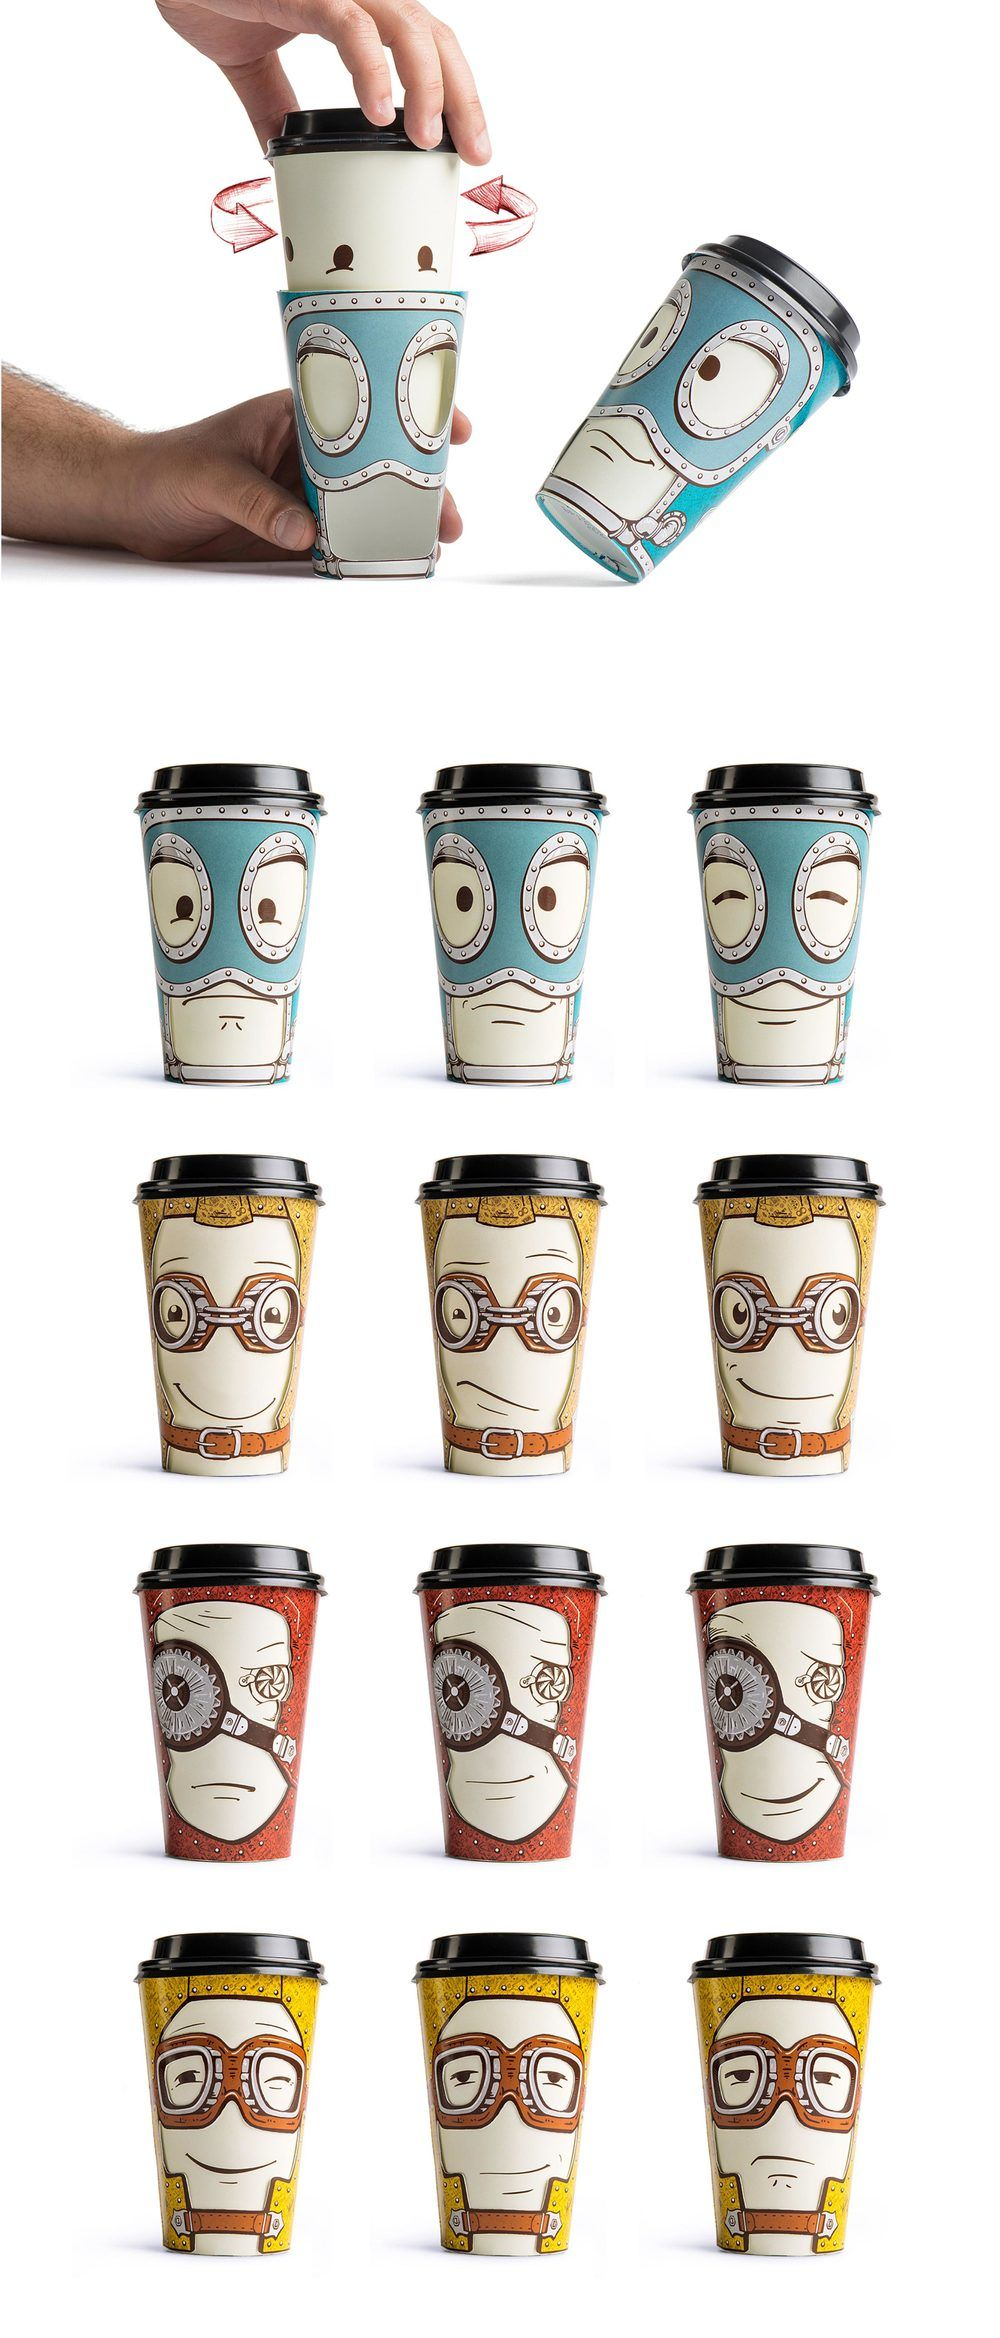 Take Away Coffee Cup Coffee Cup Design Creative Packaging Design Take Away Coffee Cup